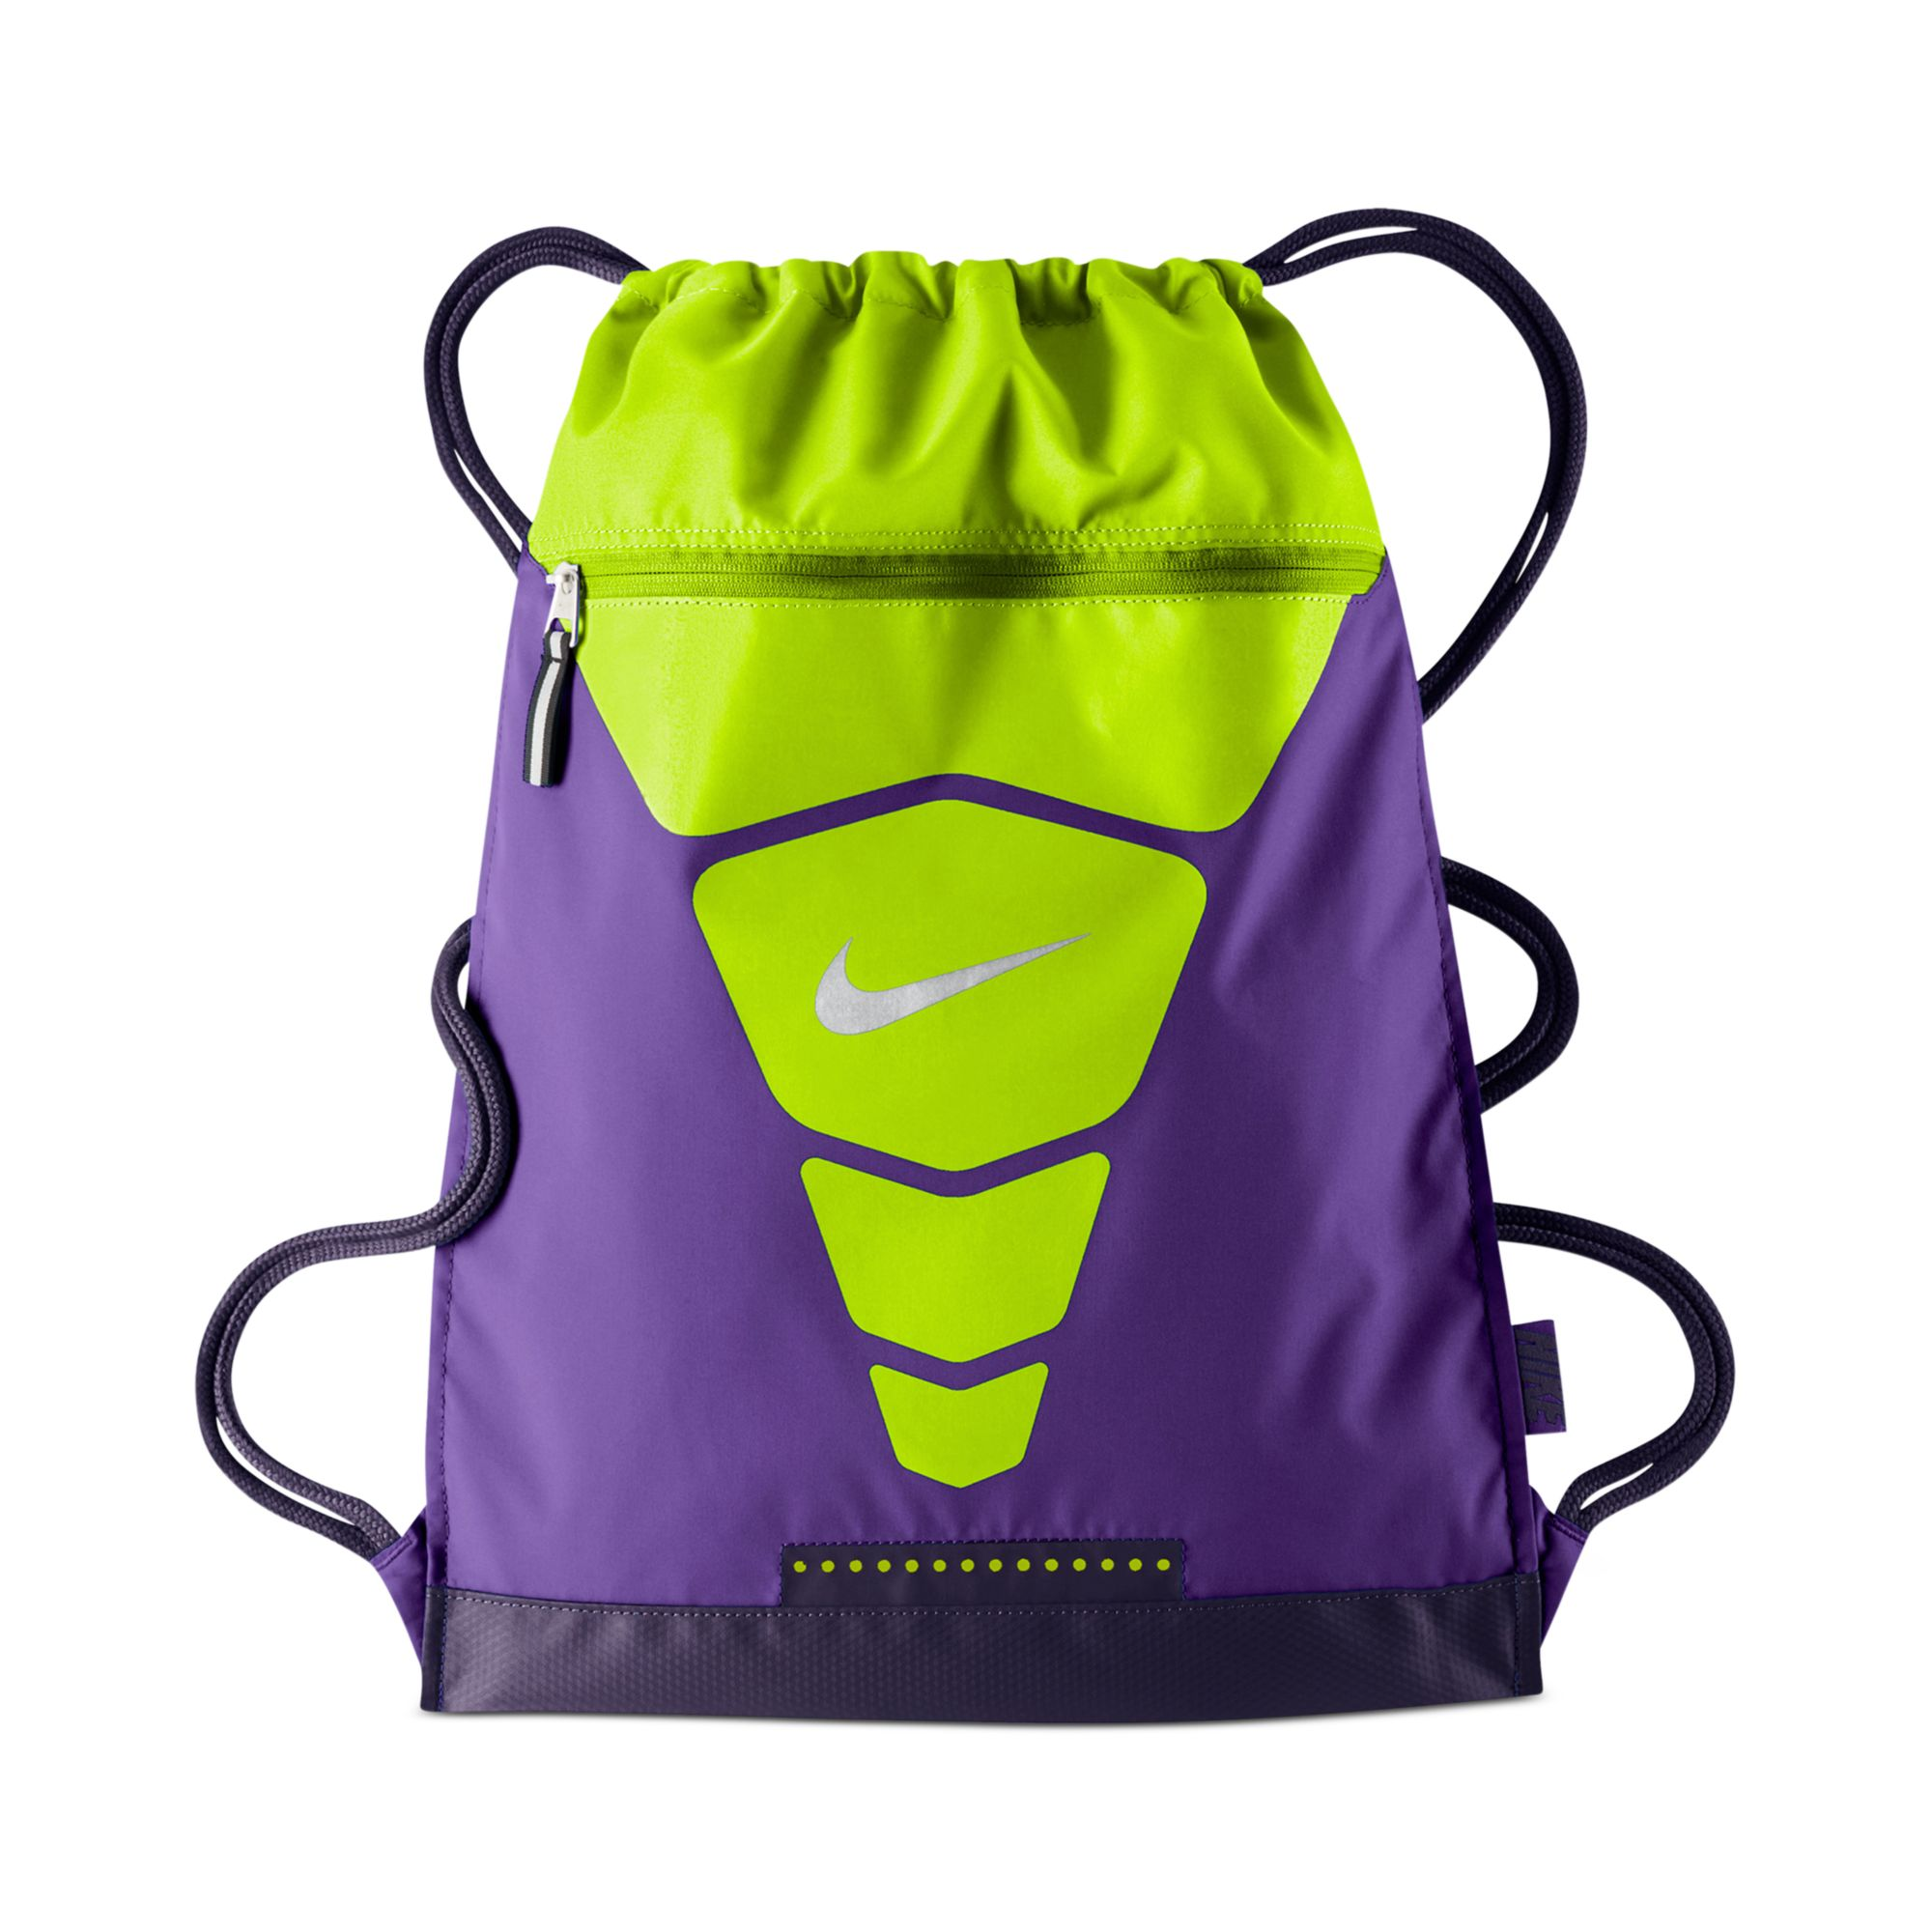 ca1f247e3fb6 Lyst - Nike Vapor Gym Sack in Purple for Men